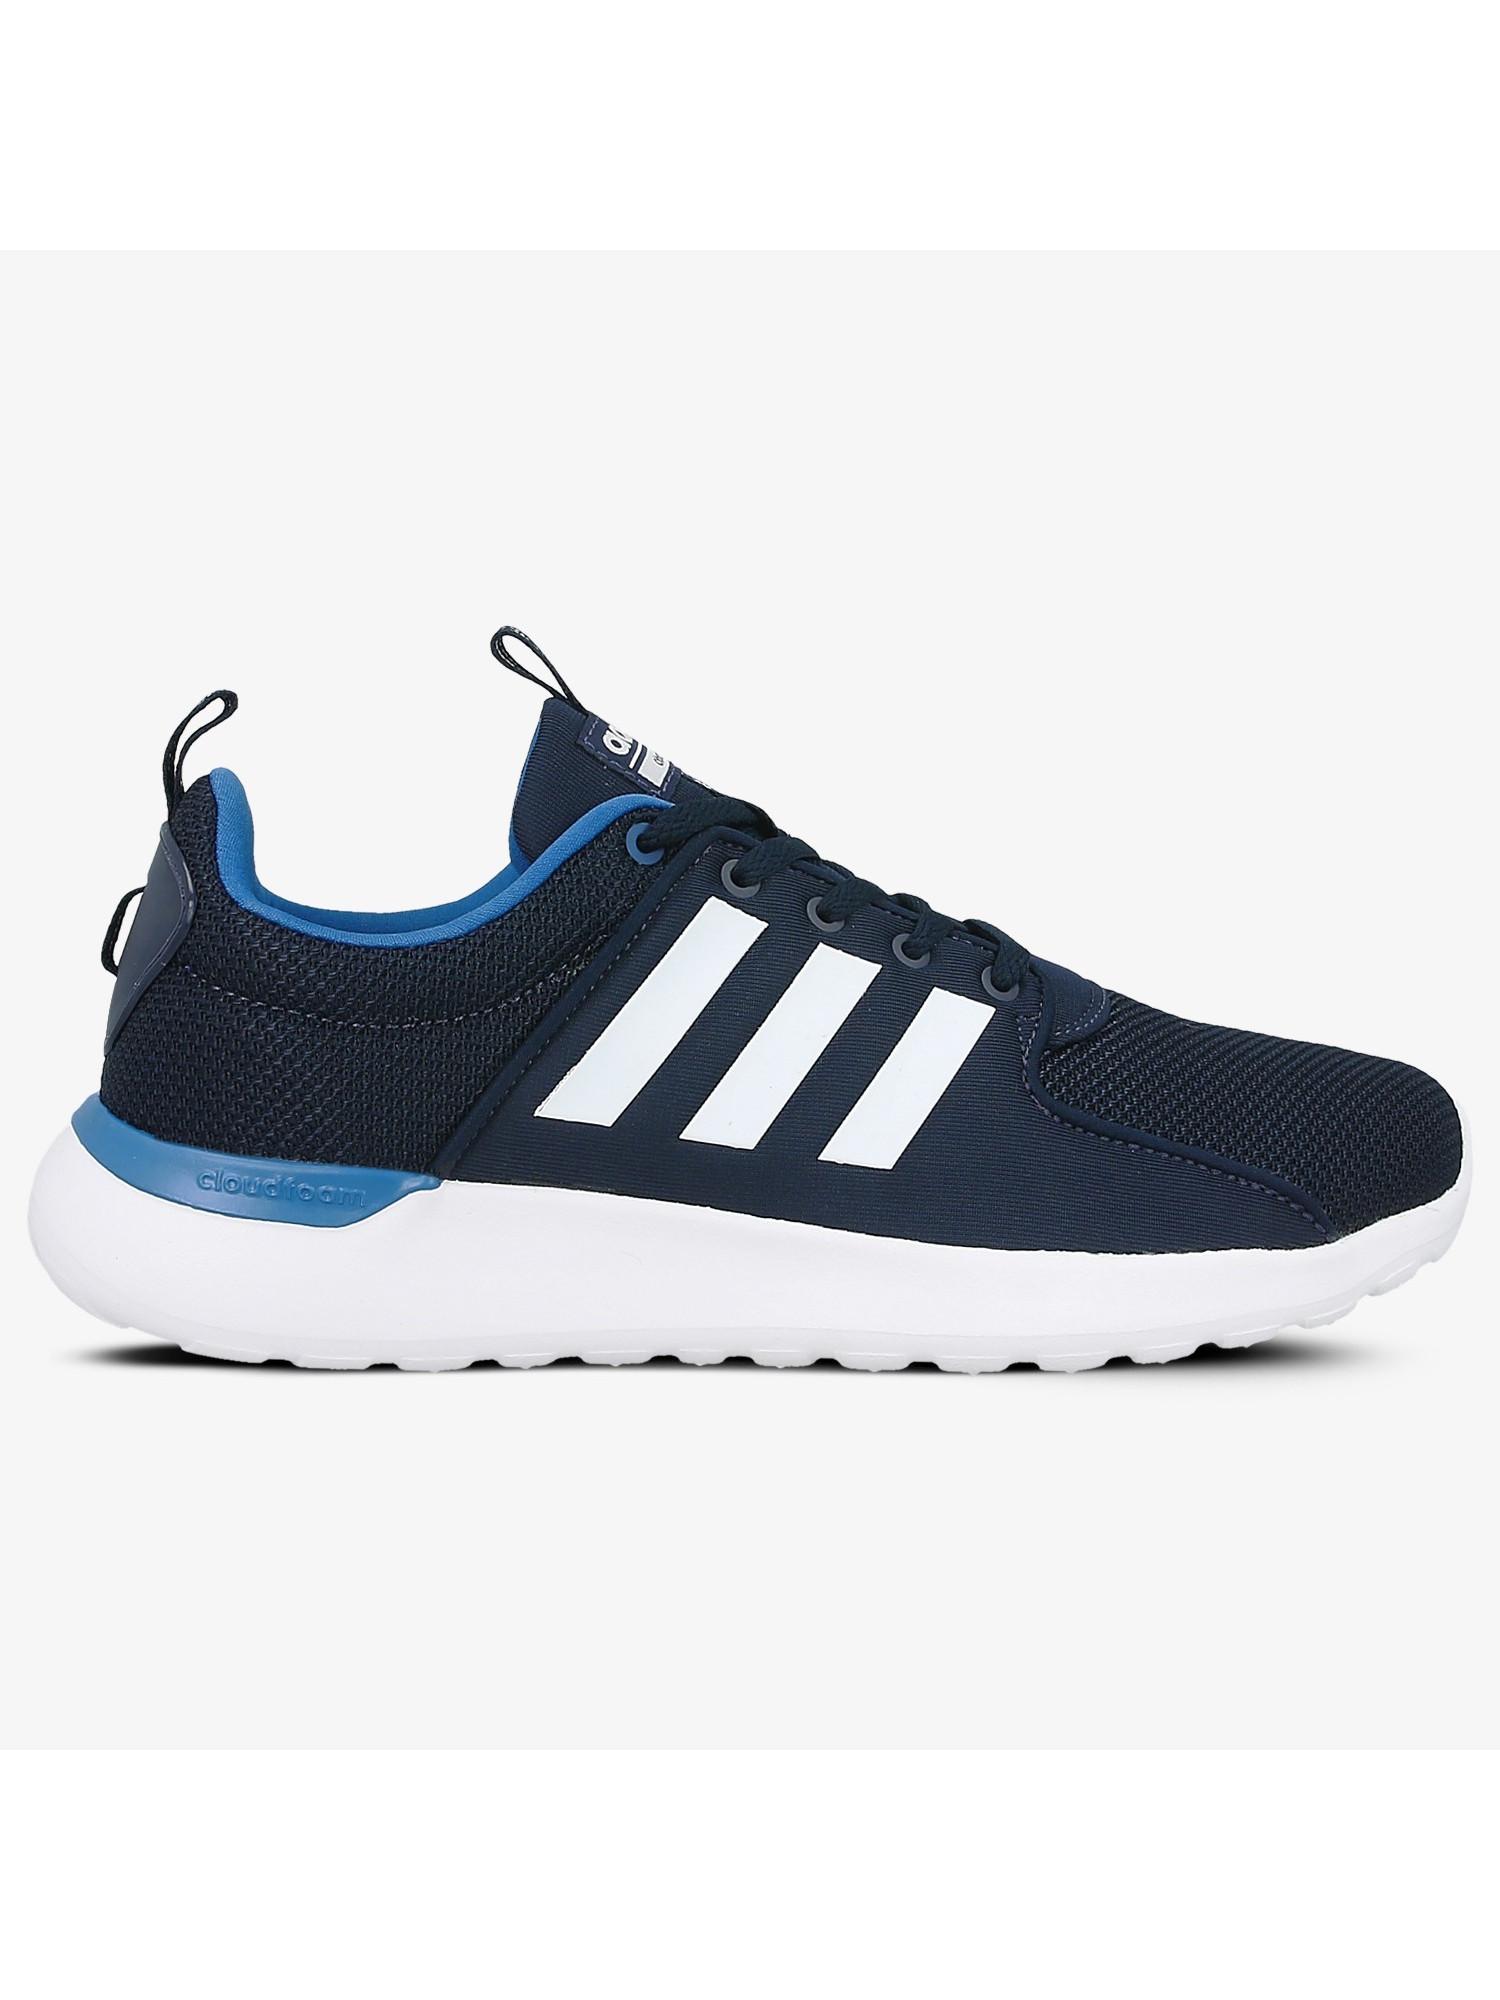 Scarpe Sneakers Running Adidas CF Cloudfoam Lite Racer rif. BB9821